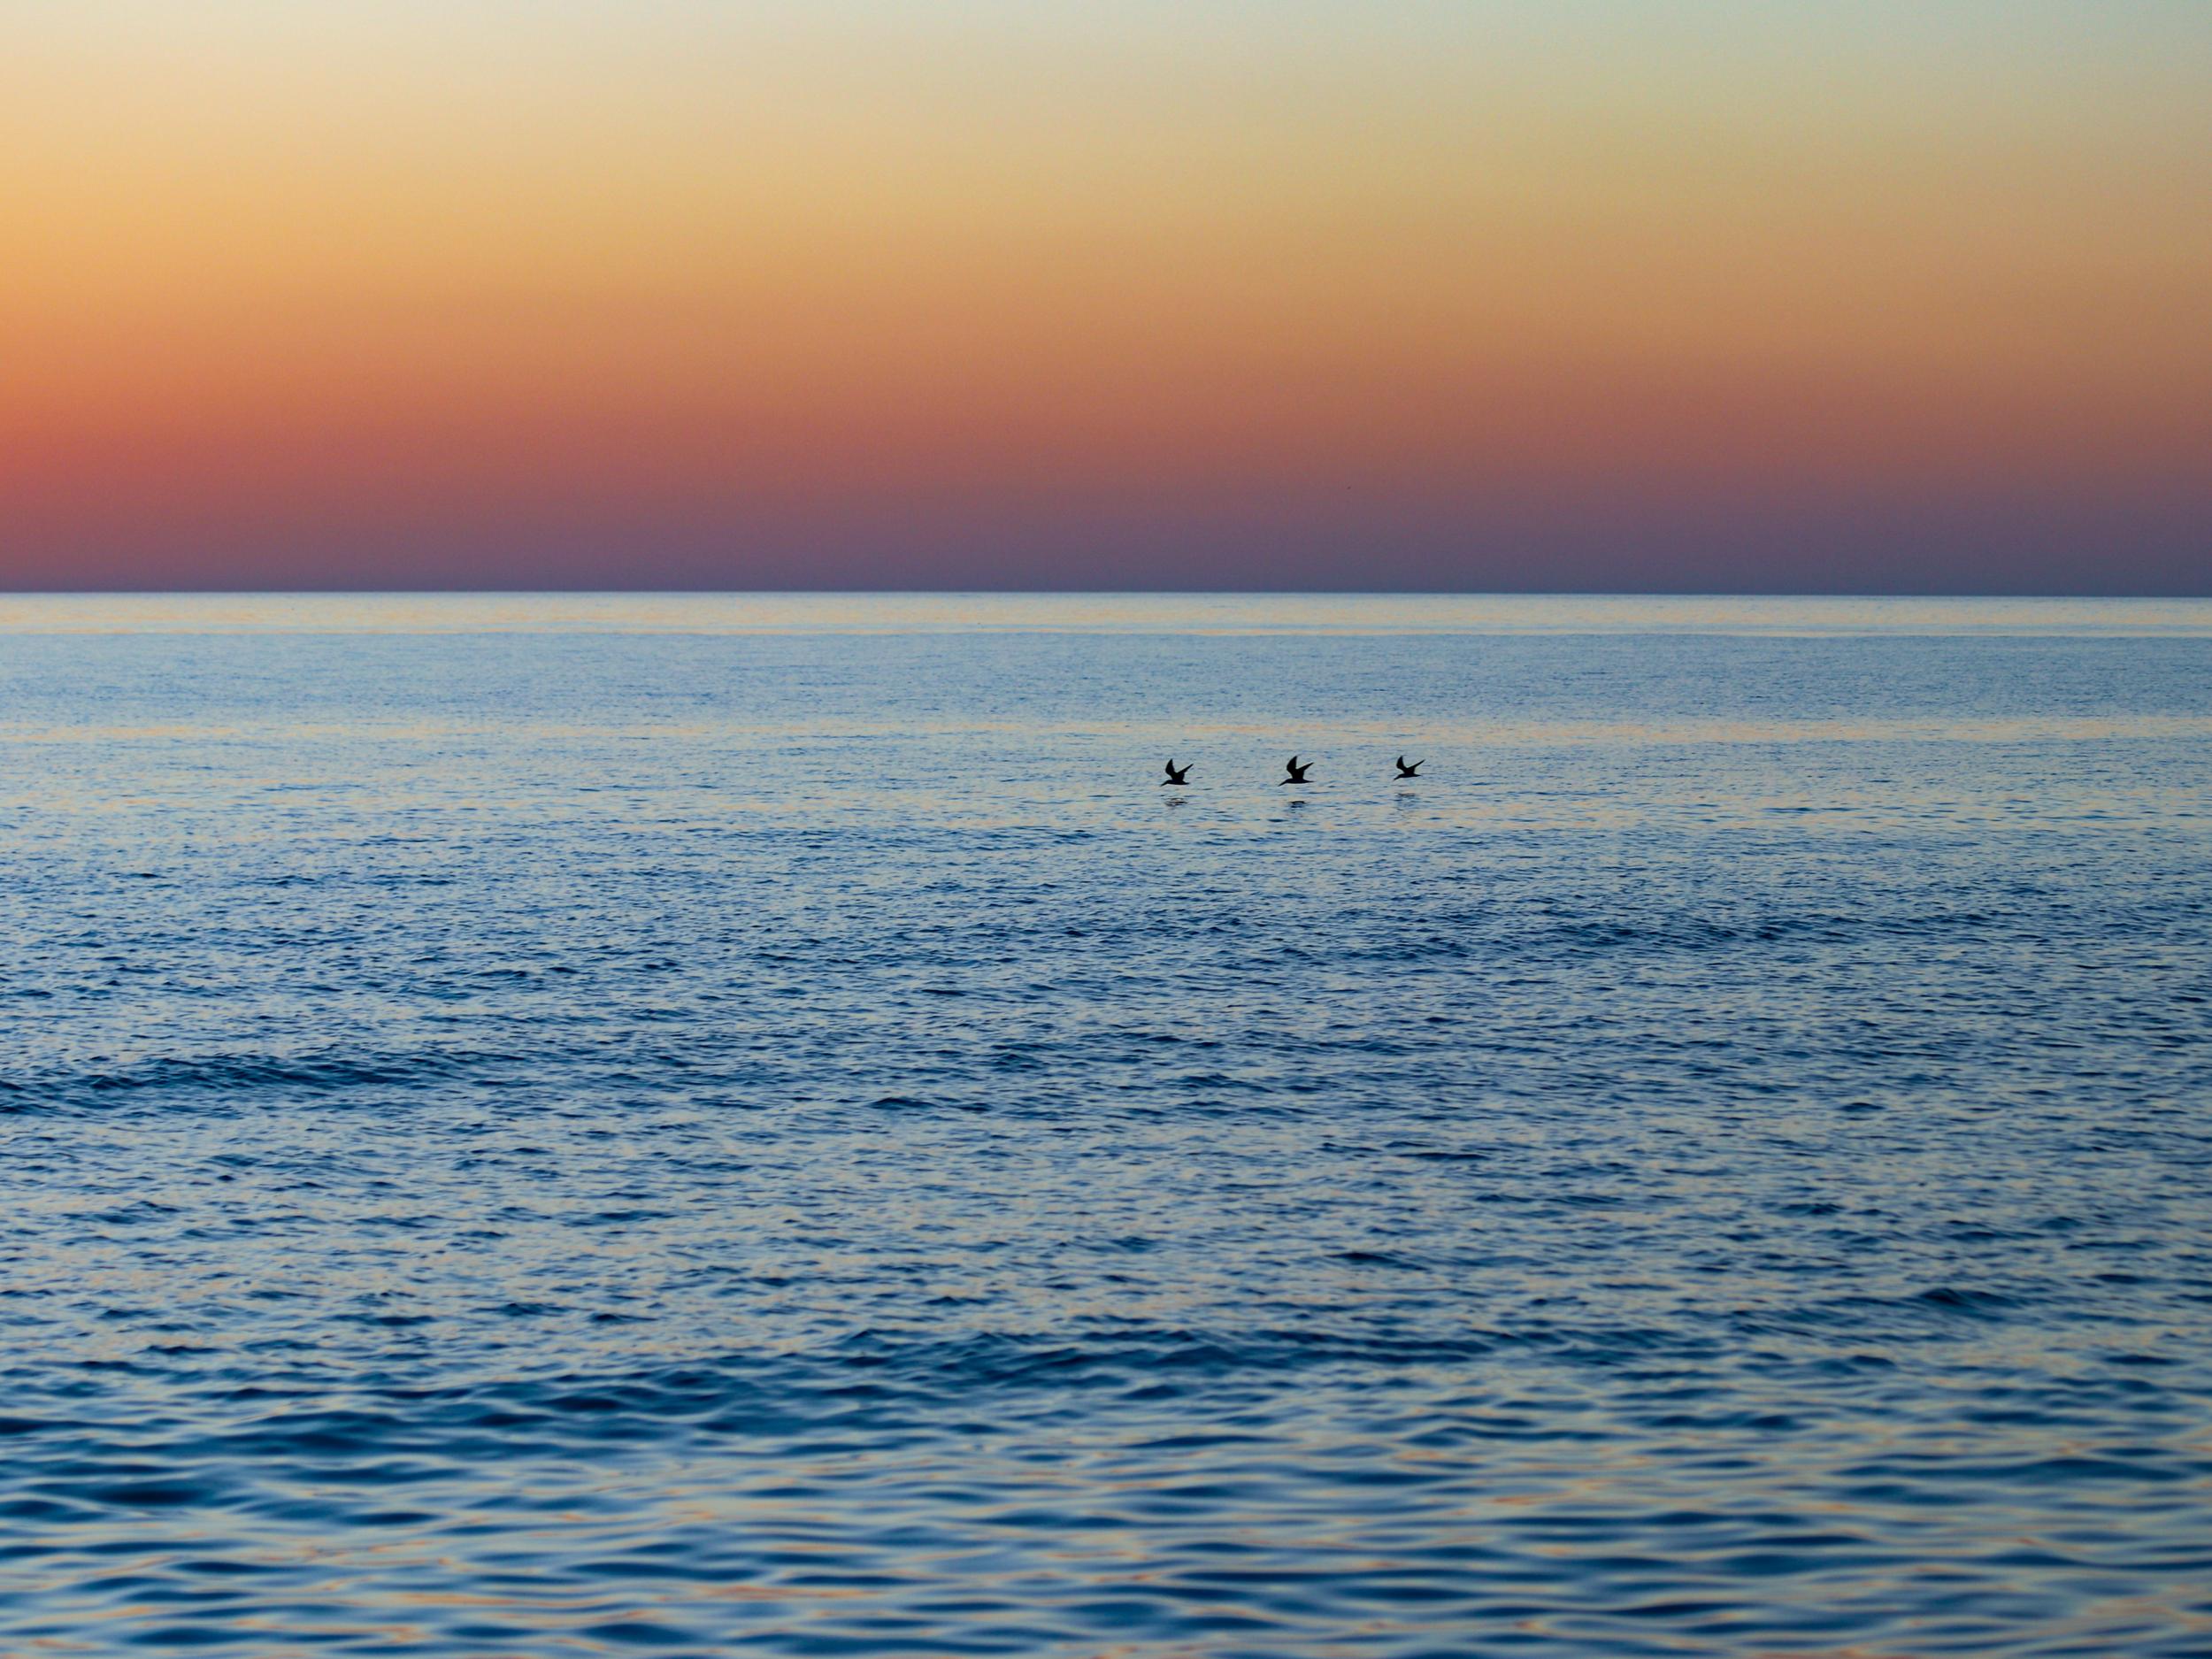 Sunset-8-Poster_printfile_default_18x24.png